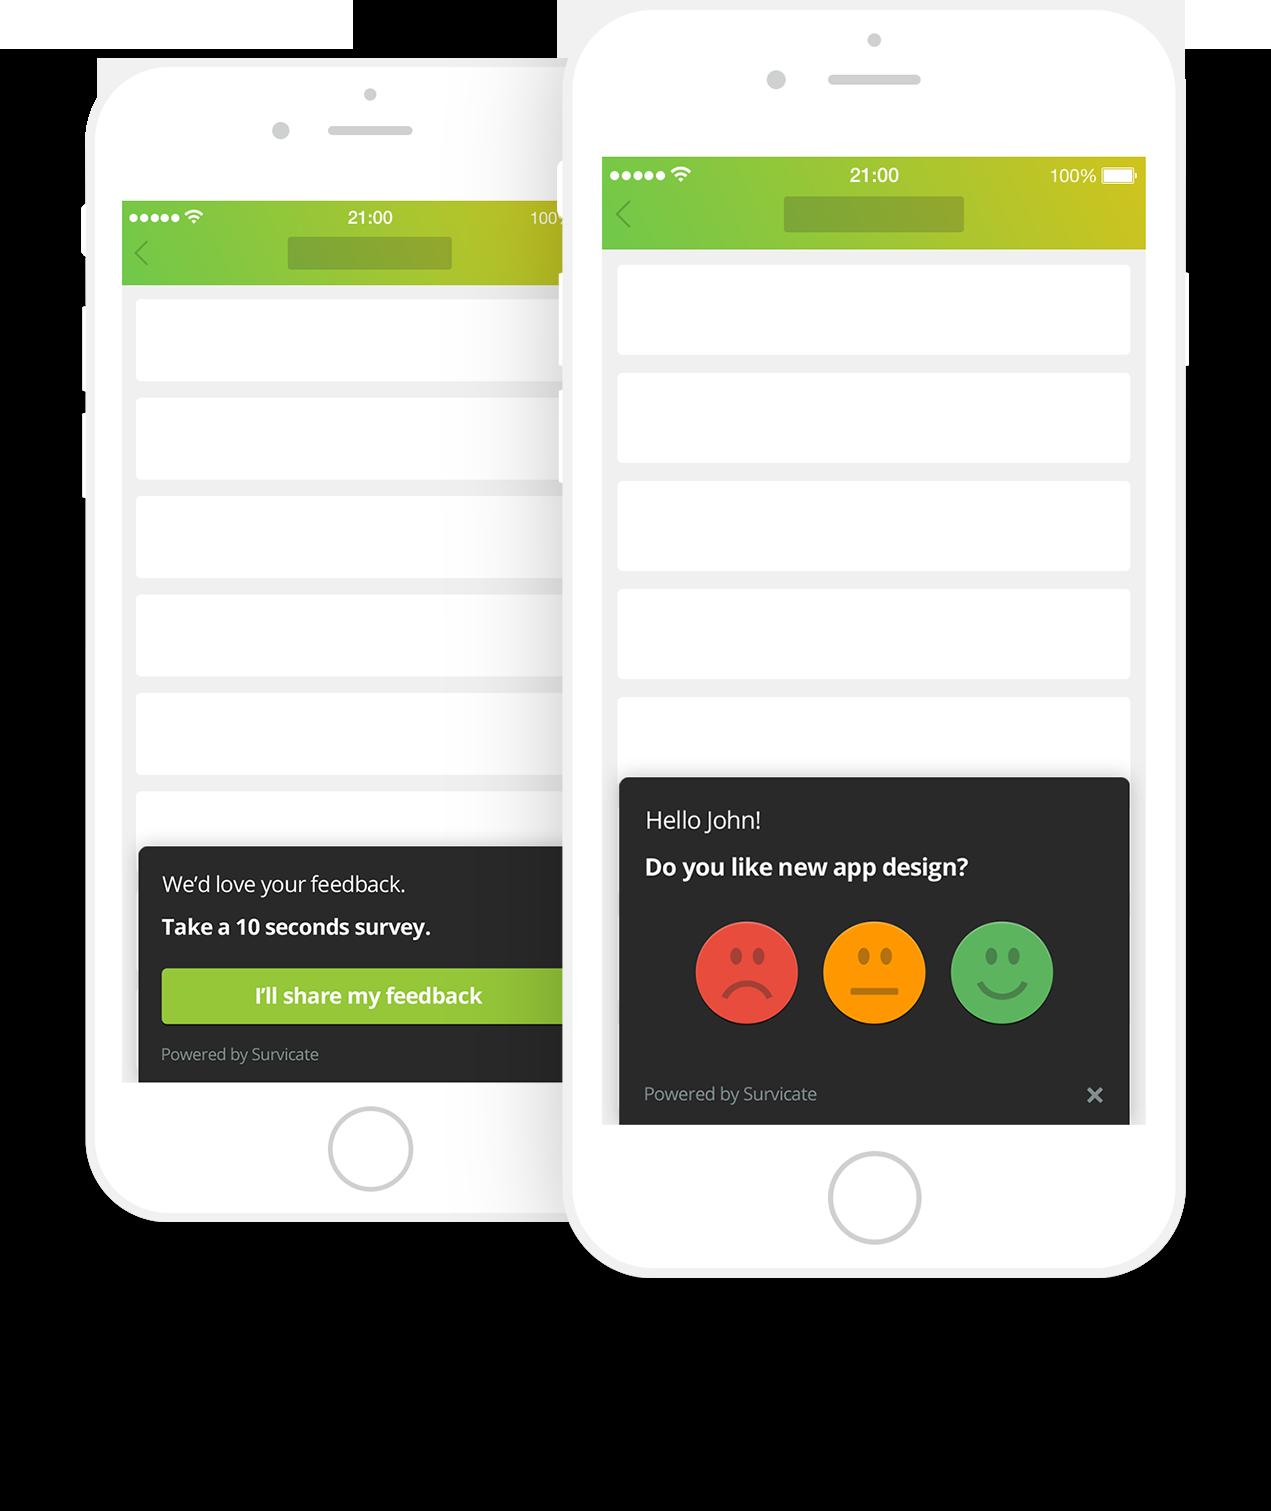 user-profiles-top-tips-feedback.png